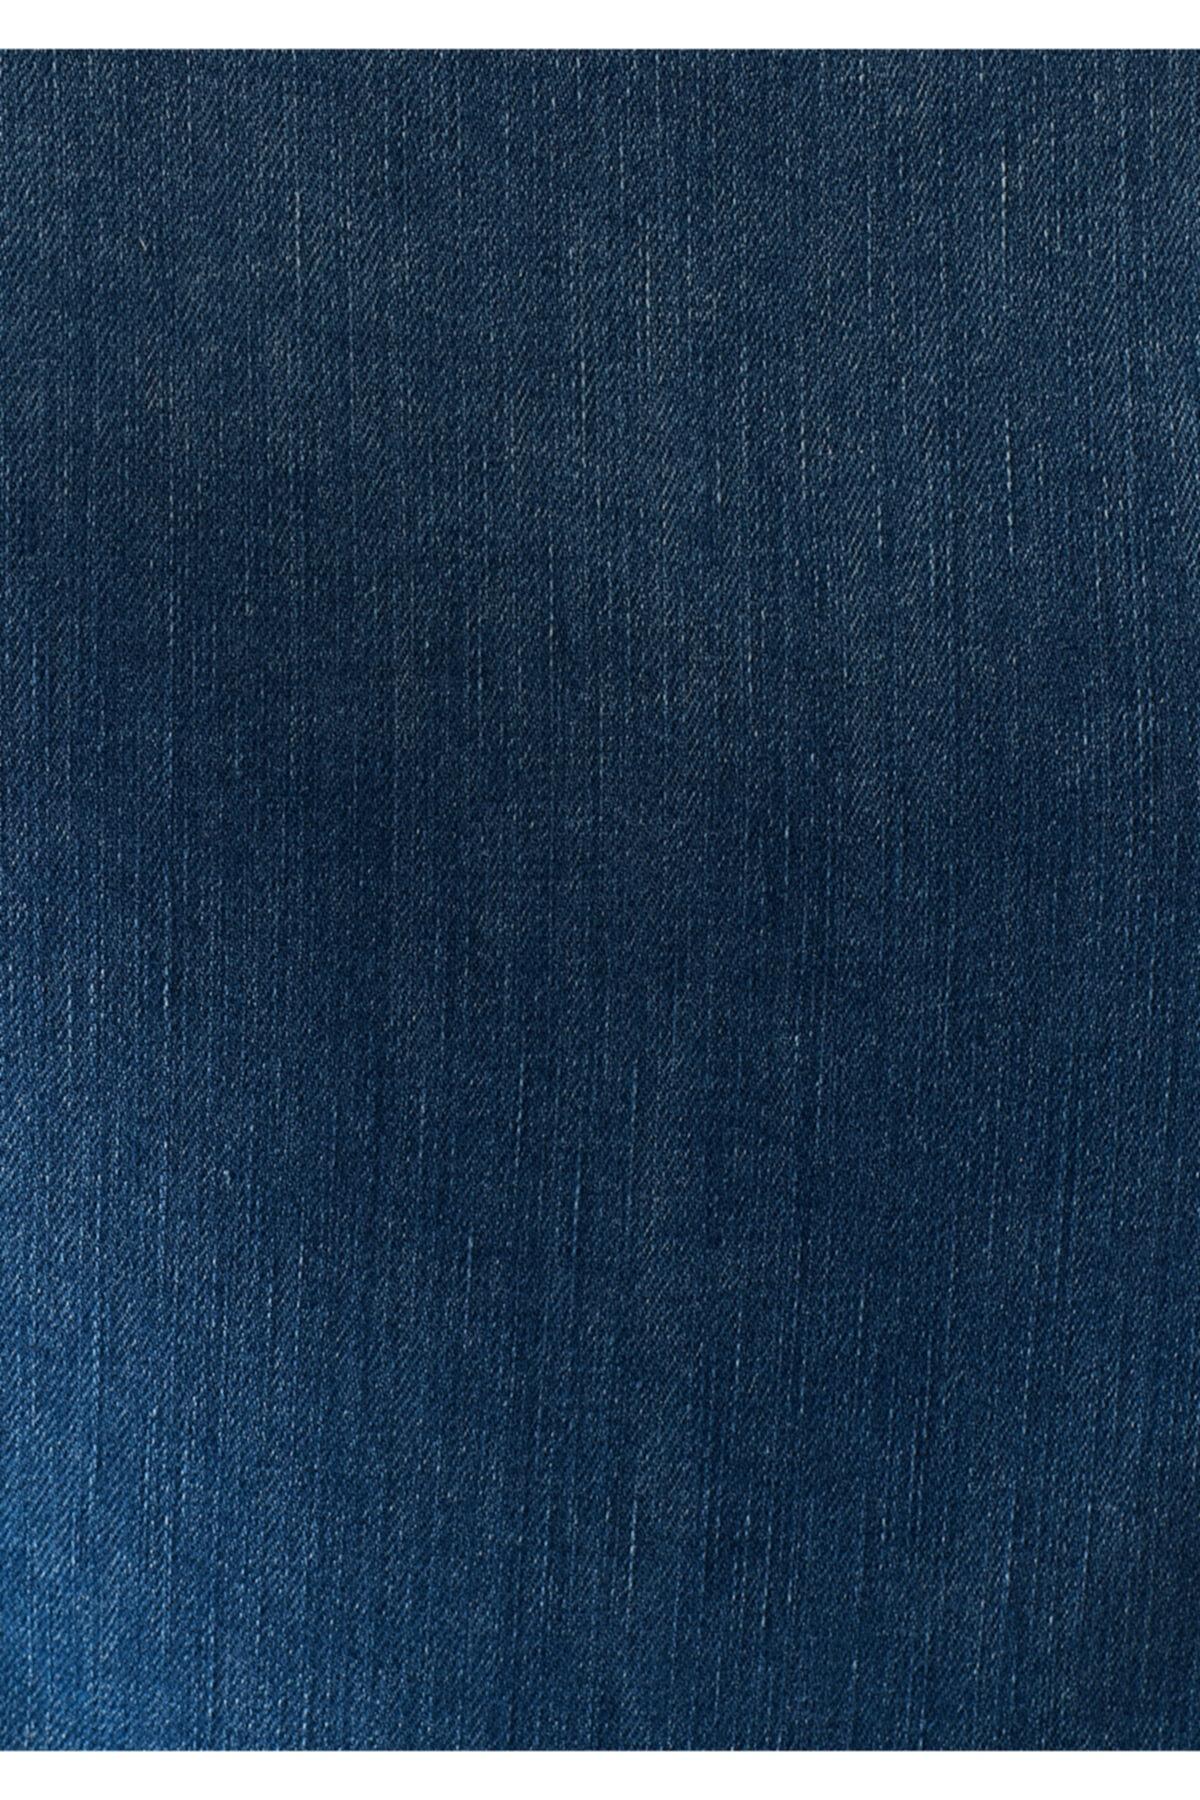 Mavi Daphne 90 S Eskitilmiş Indigo Jean Ceket 1174132062 1